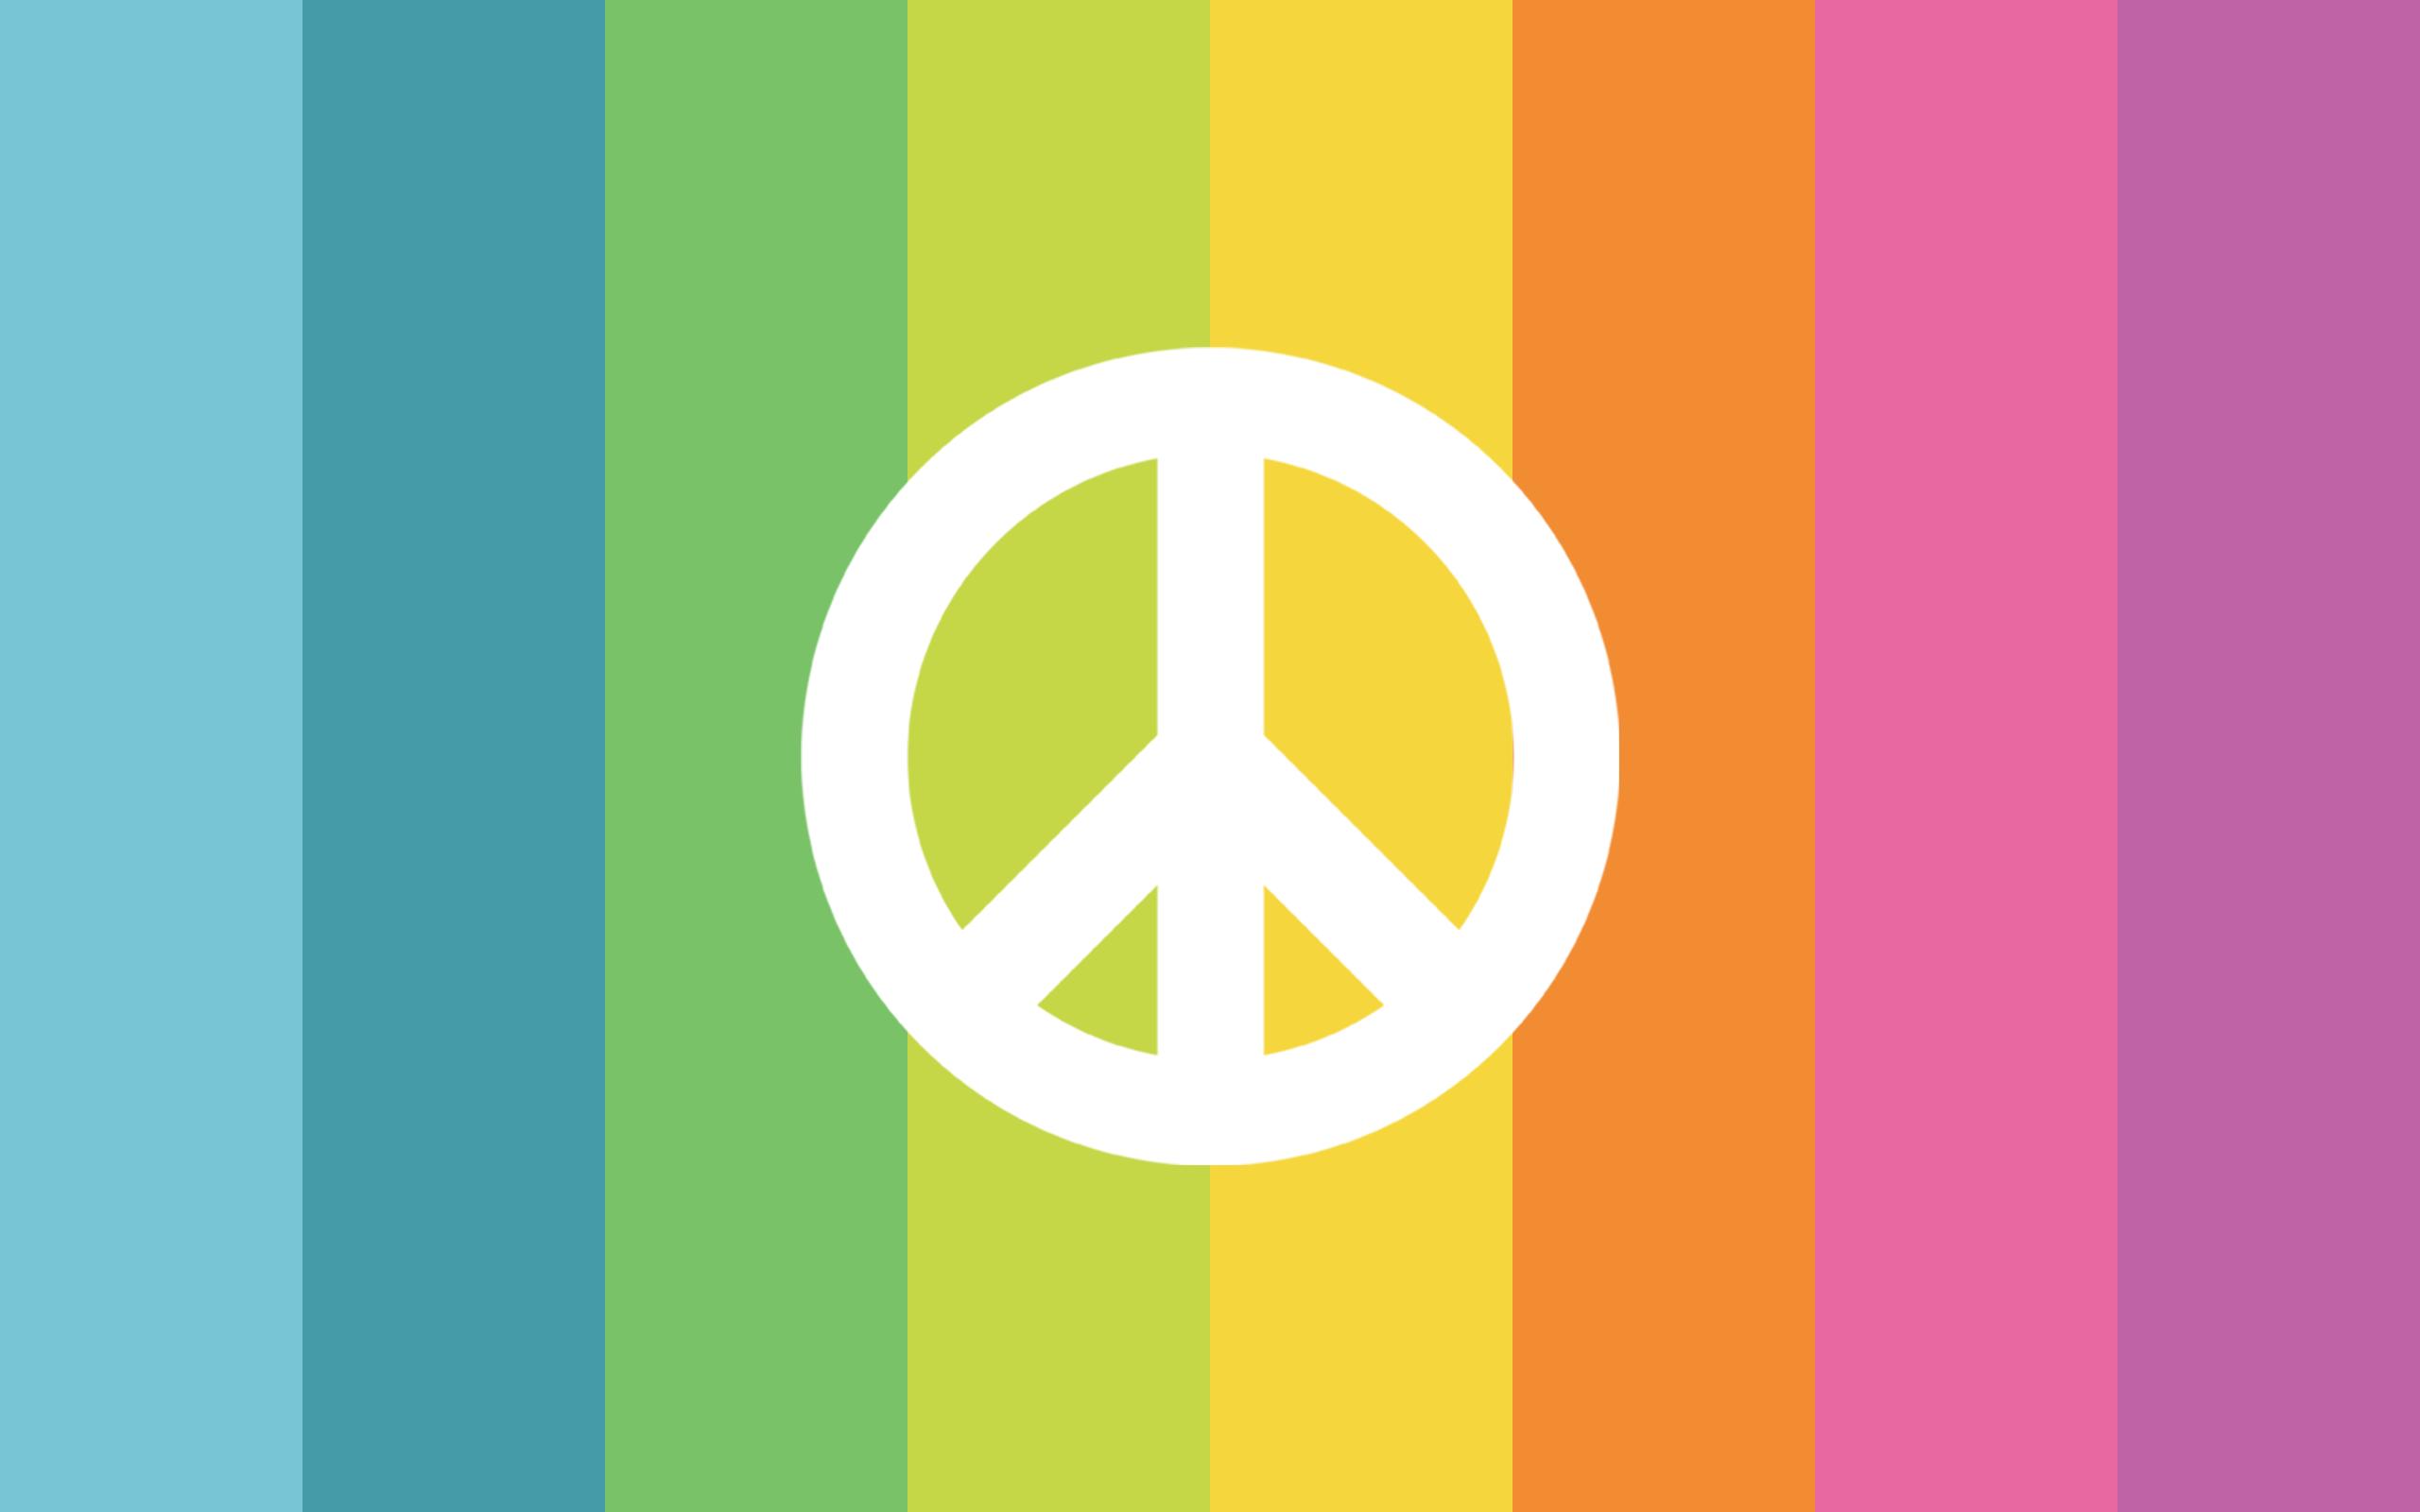 Peace Sign Backgrounds For Desktop 2560x1600